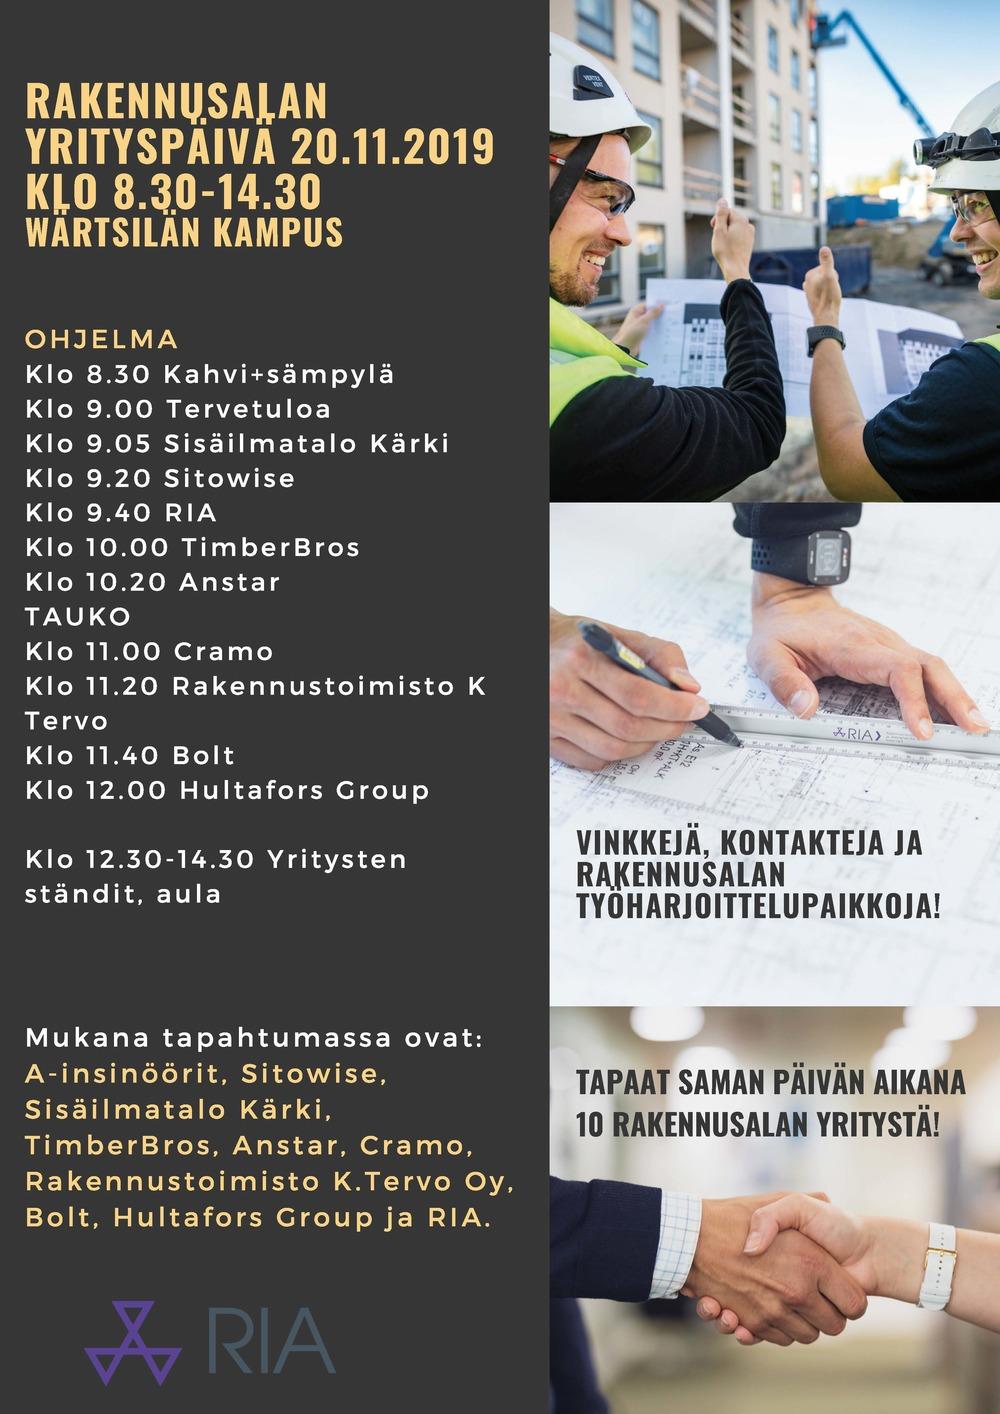 Ohjelma Karelia 20 11